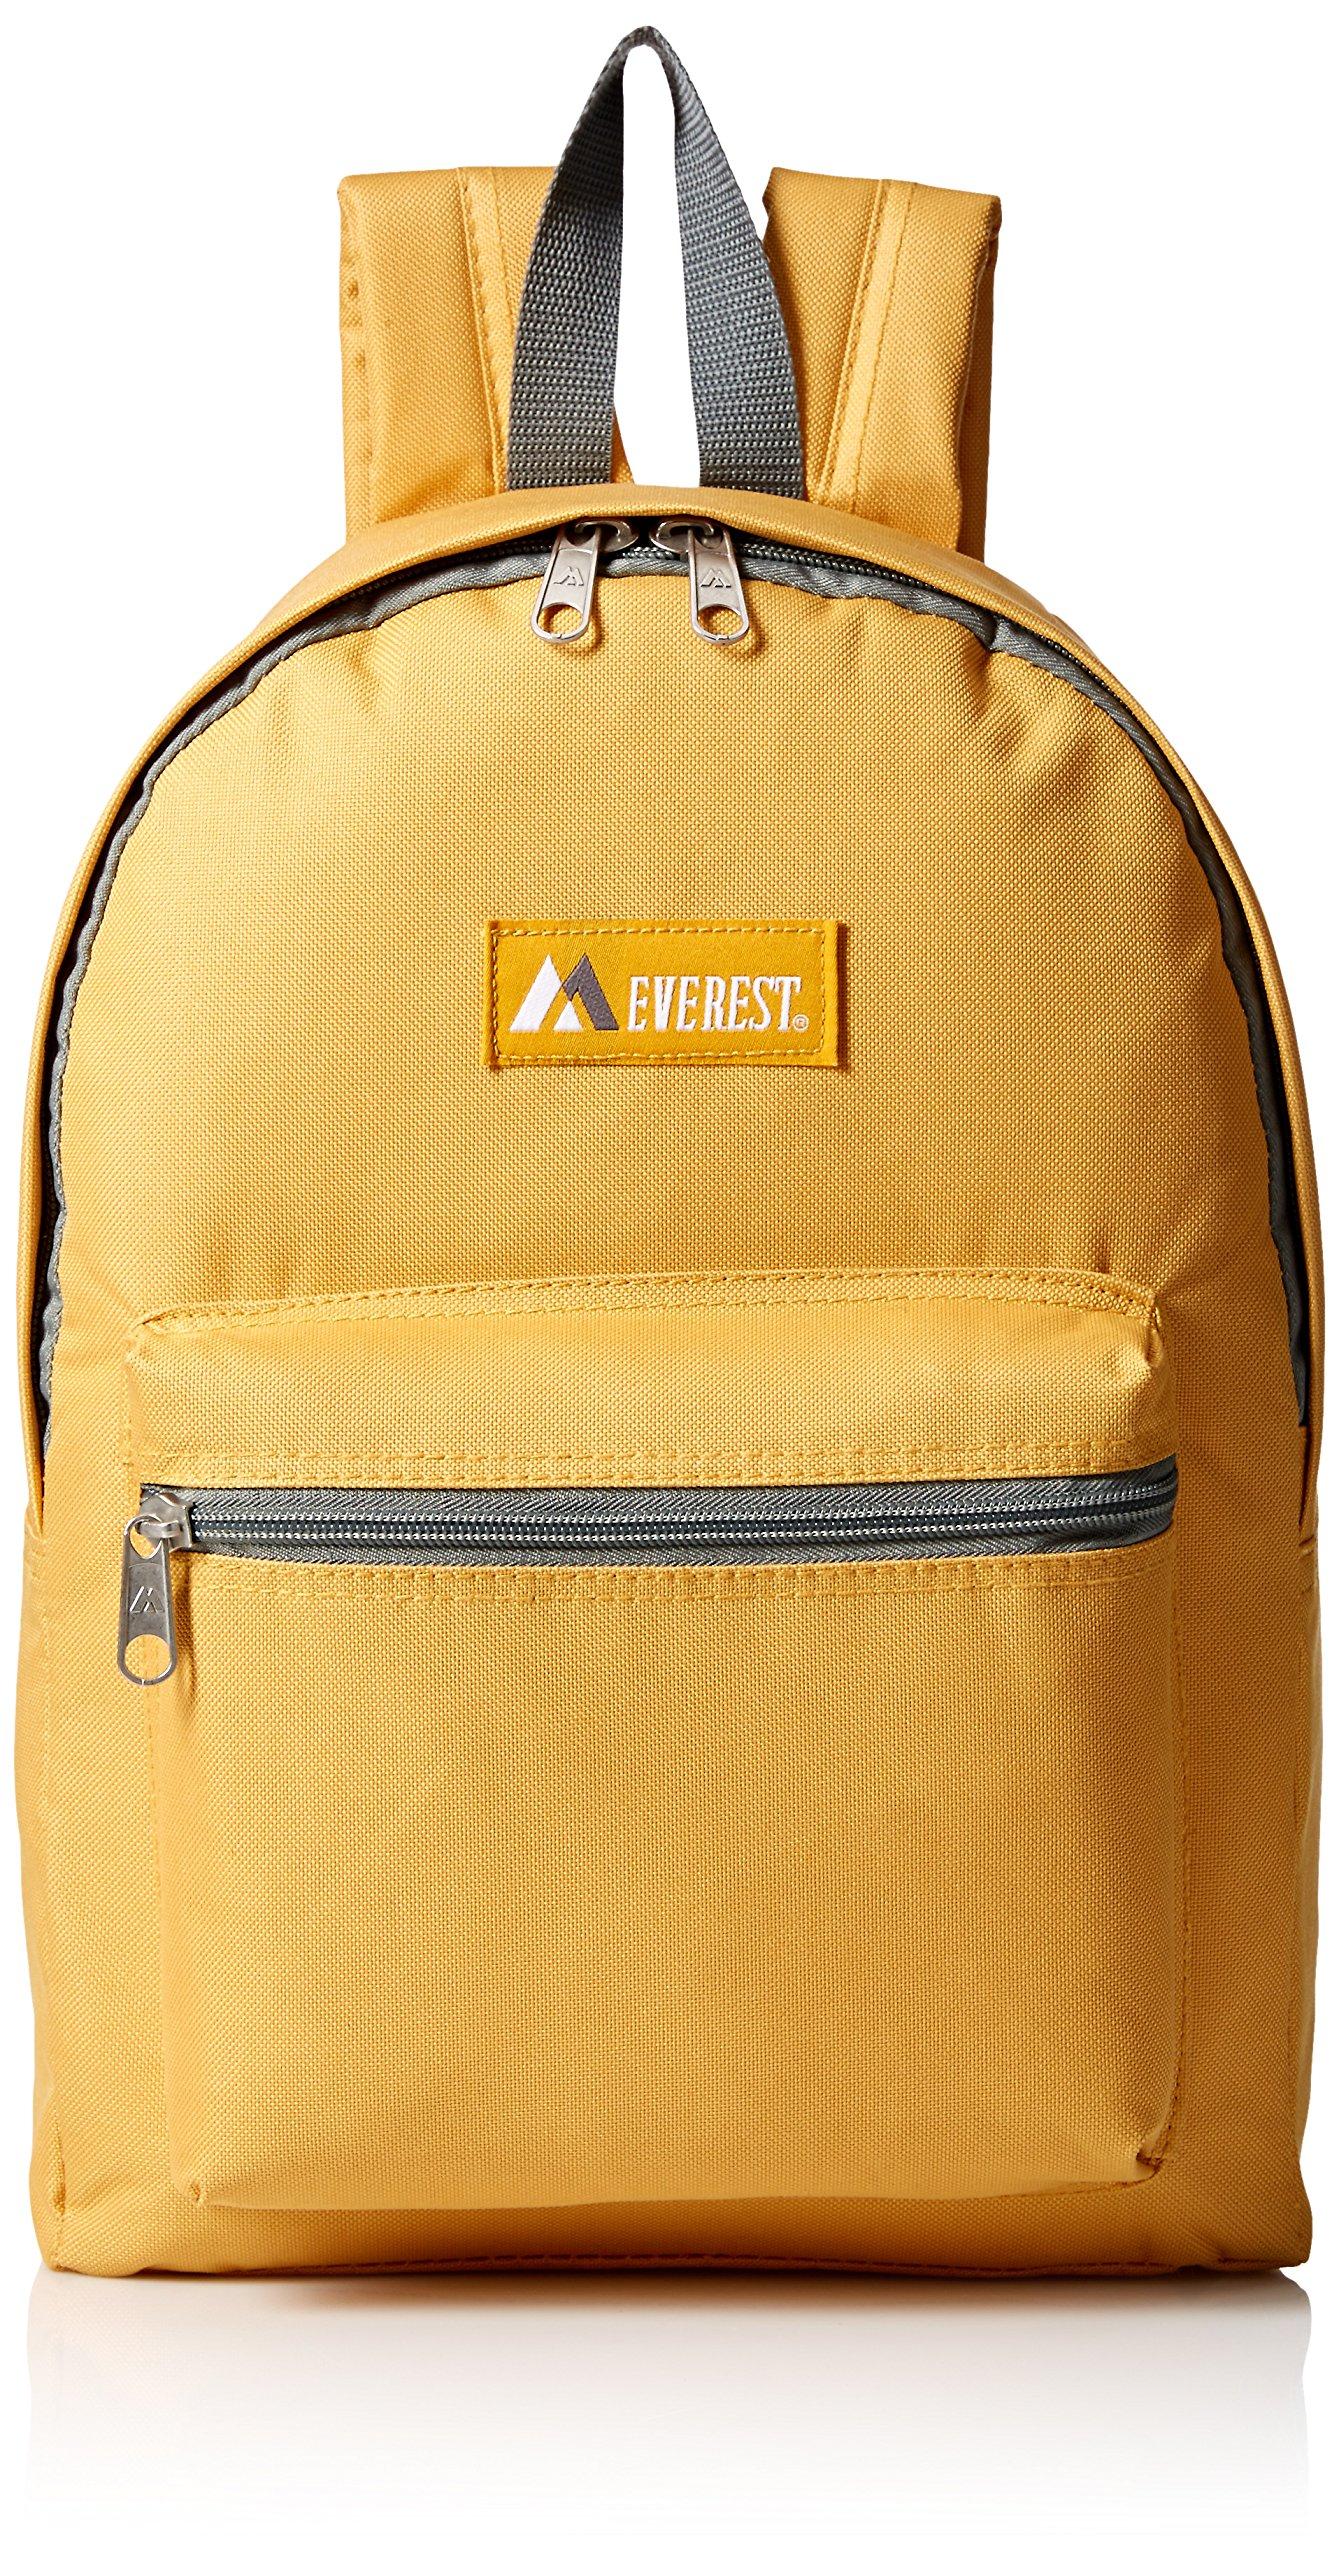 Everest Basic Backpack, Yellow, One Size